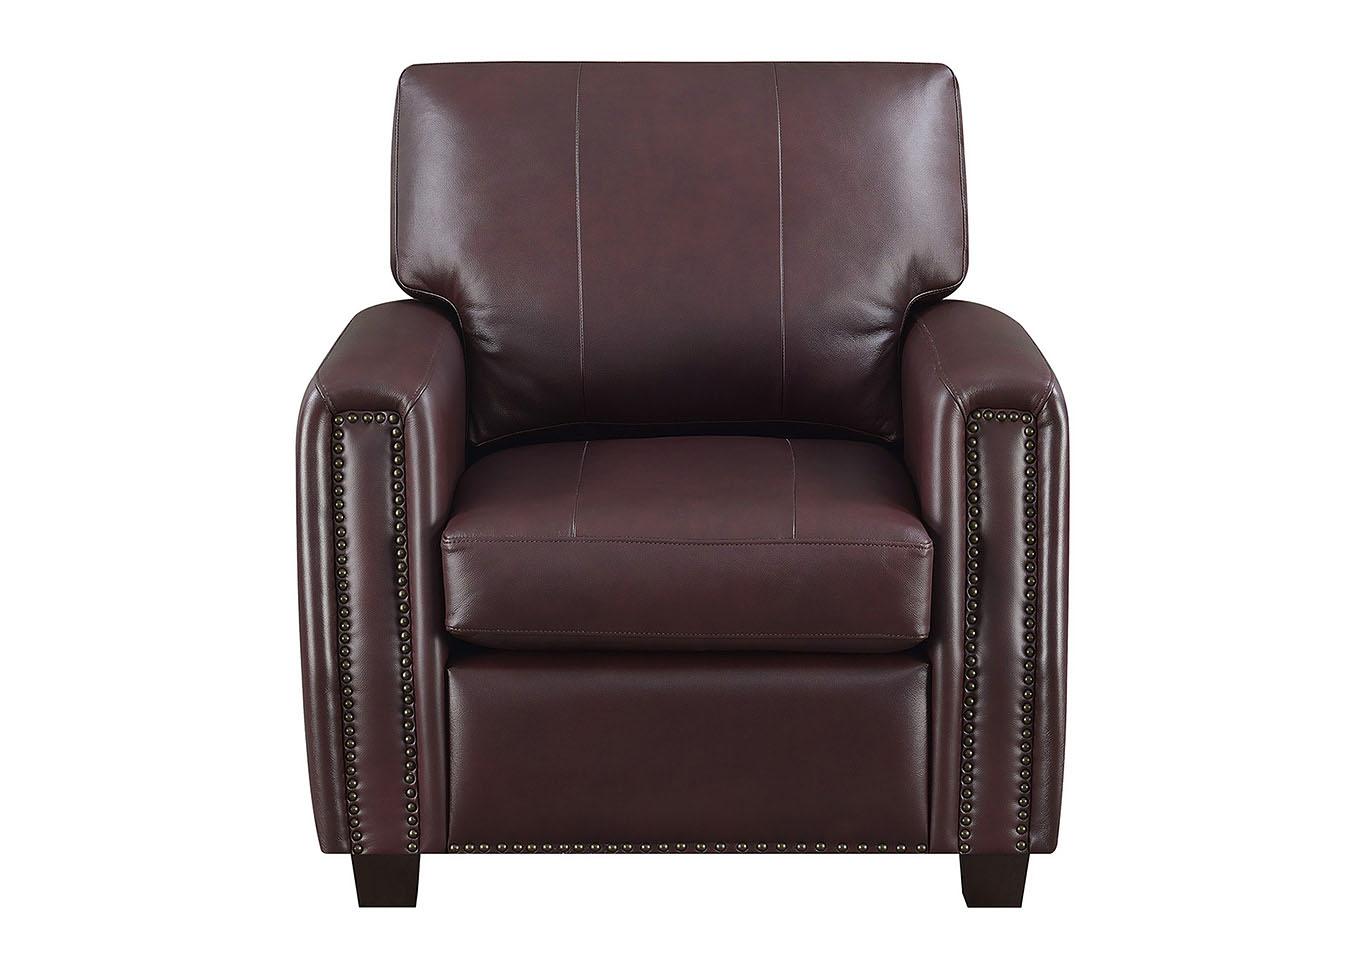 Strange Best Buy Furniture And Mattress Stephanie Burgundy Leather Ibusinesslaw Wood Chair Design Ideas Ibusinesslaworg